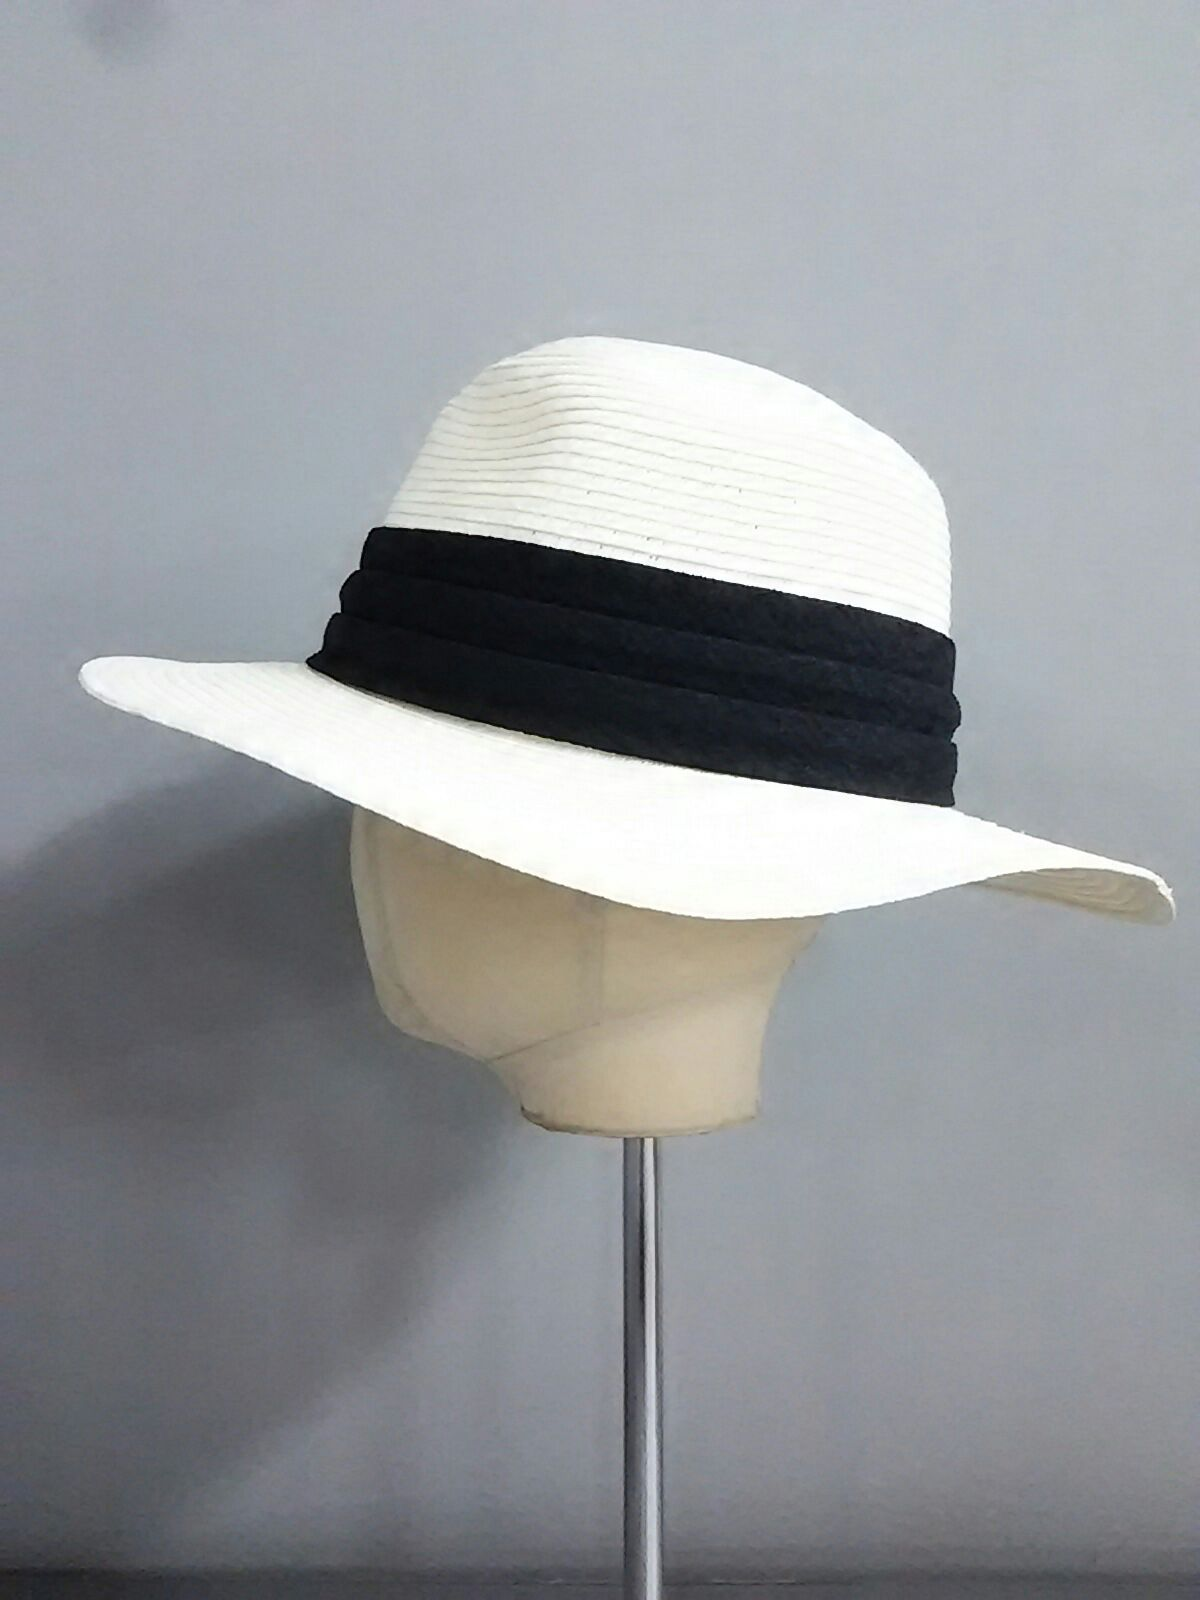 EugeniaKim(ユージニアキム)の帽子